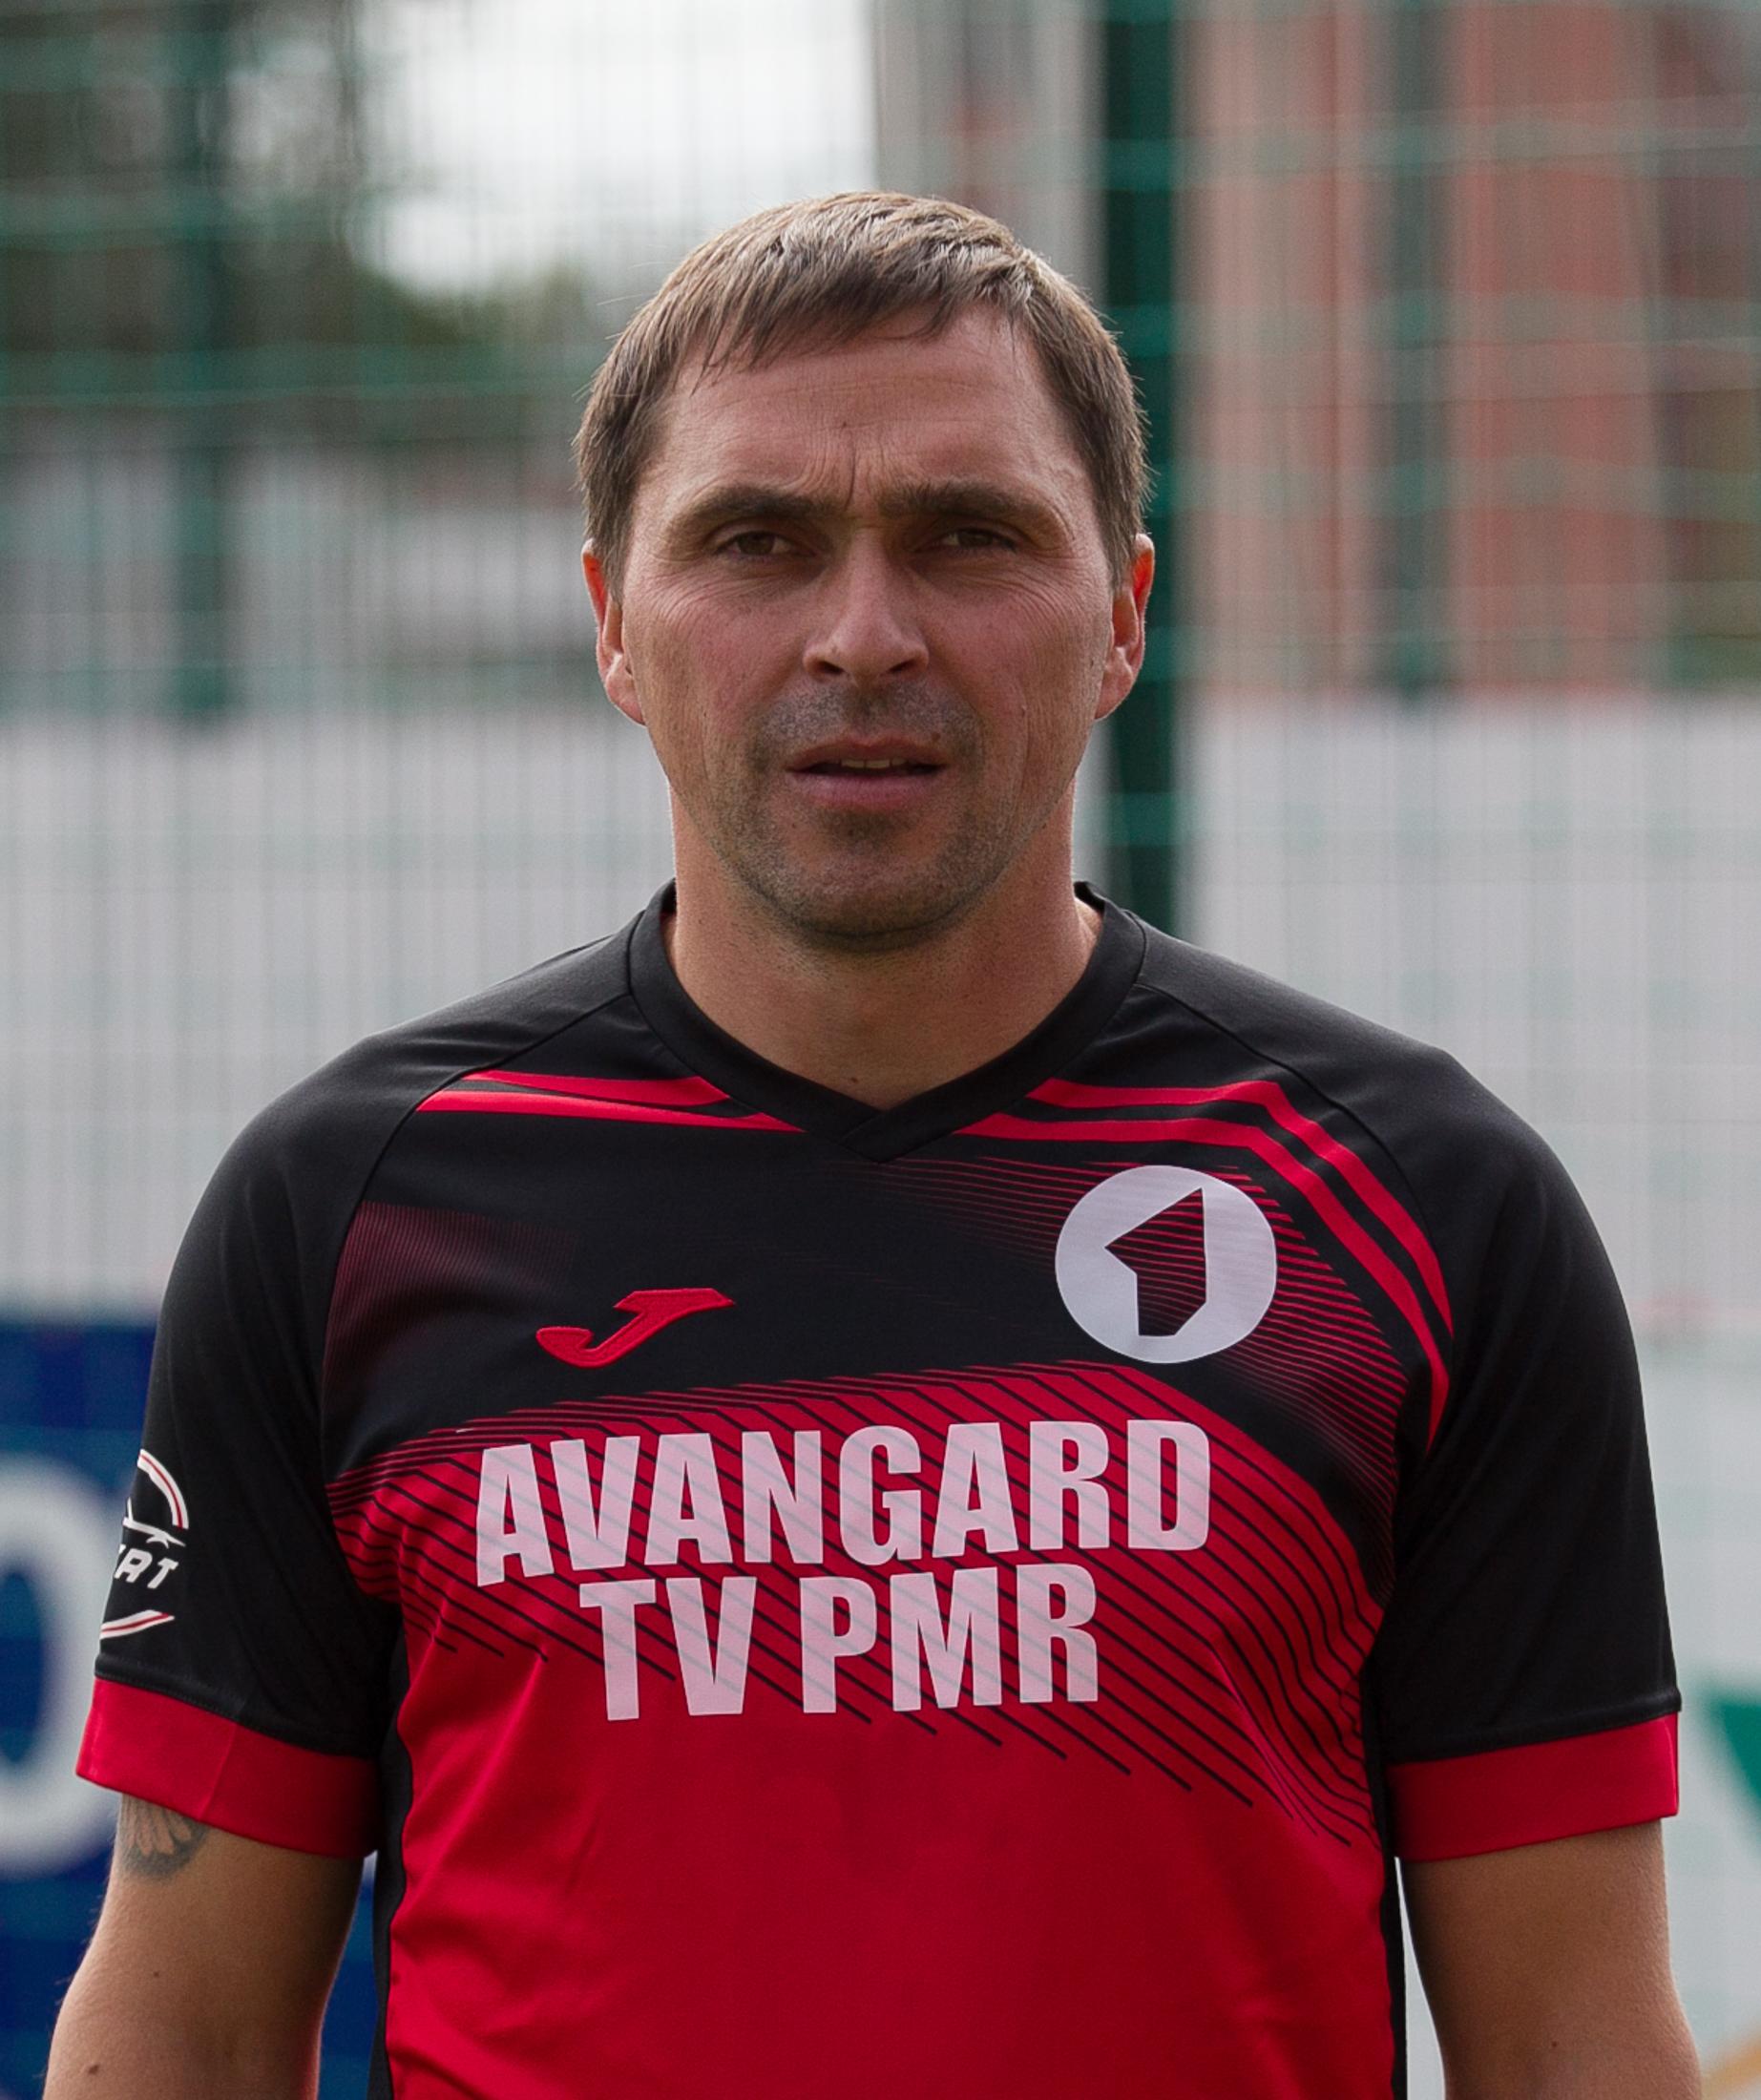 Ткачук Андрей